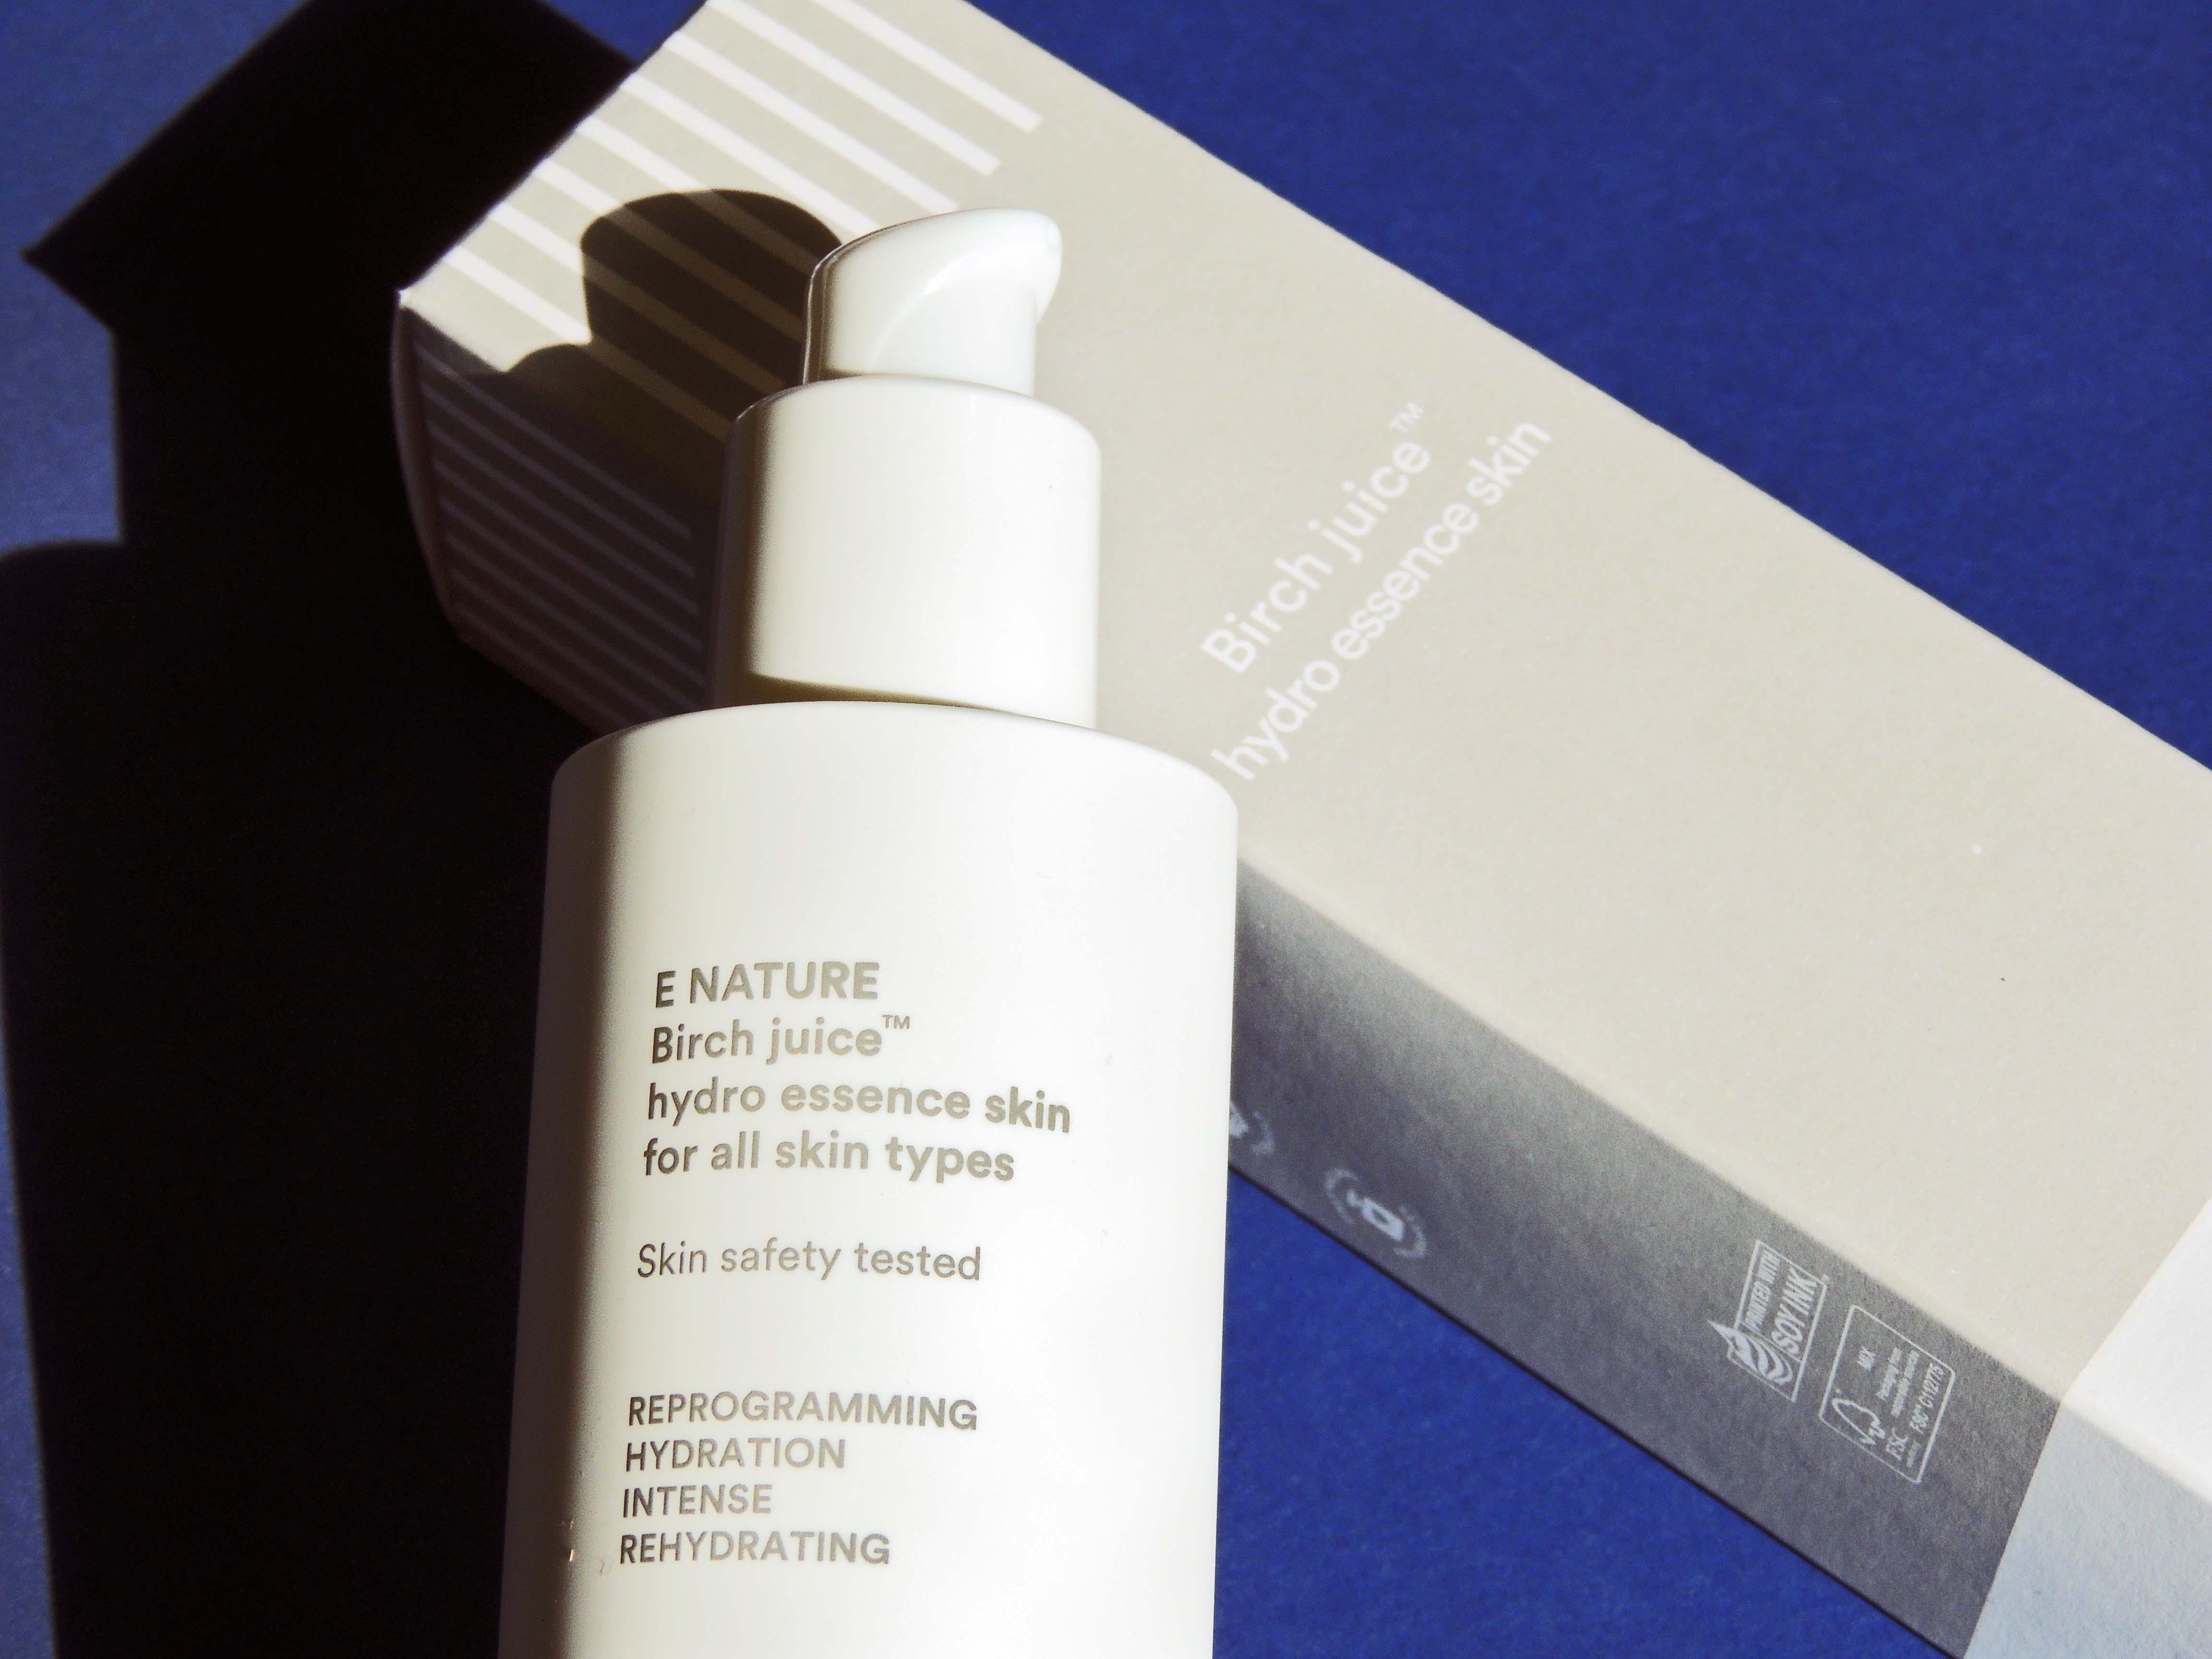 E Nature Birch Juice Hydro Essence Skin Blueberry Cosmetics 2